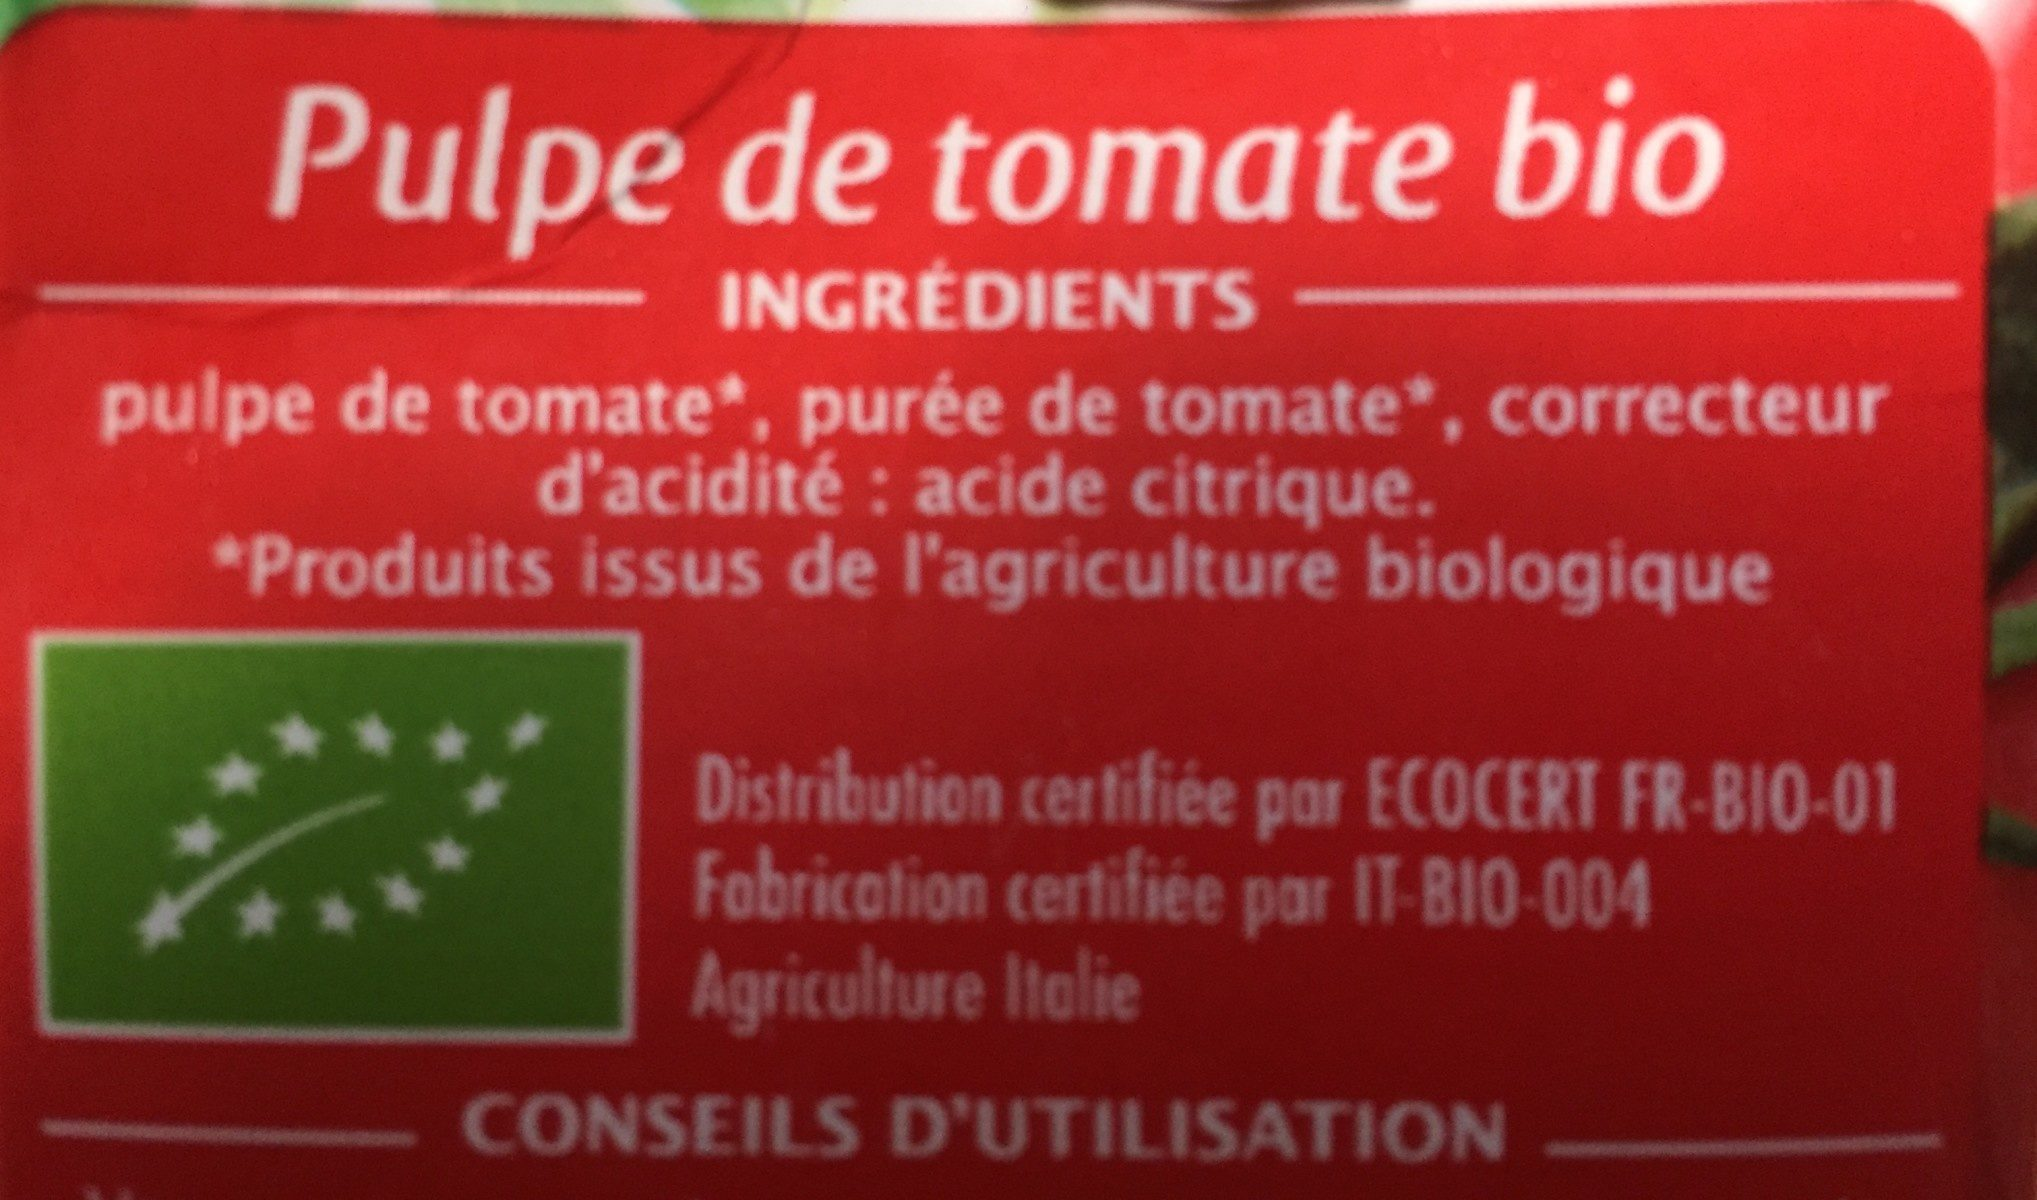 Pulpe de tomate bio - Ingrediënten